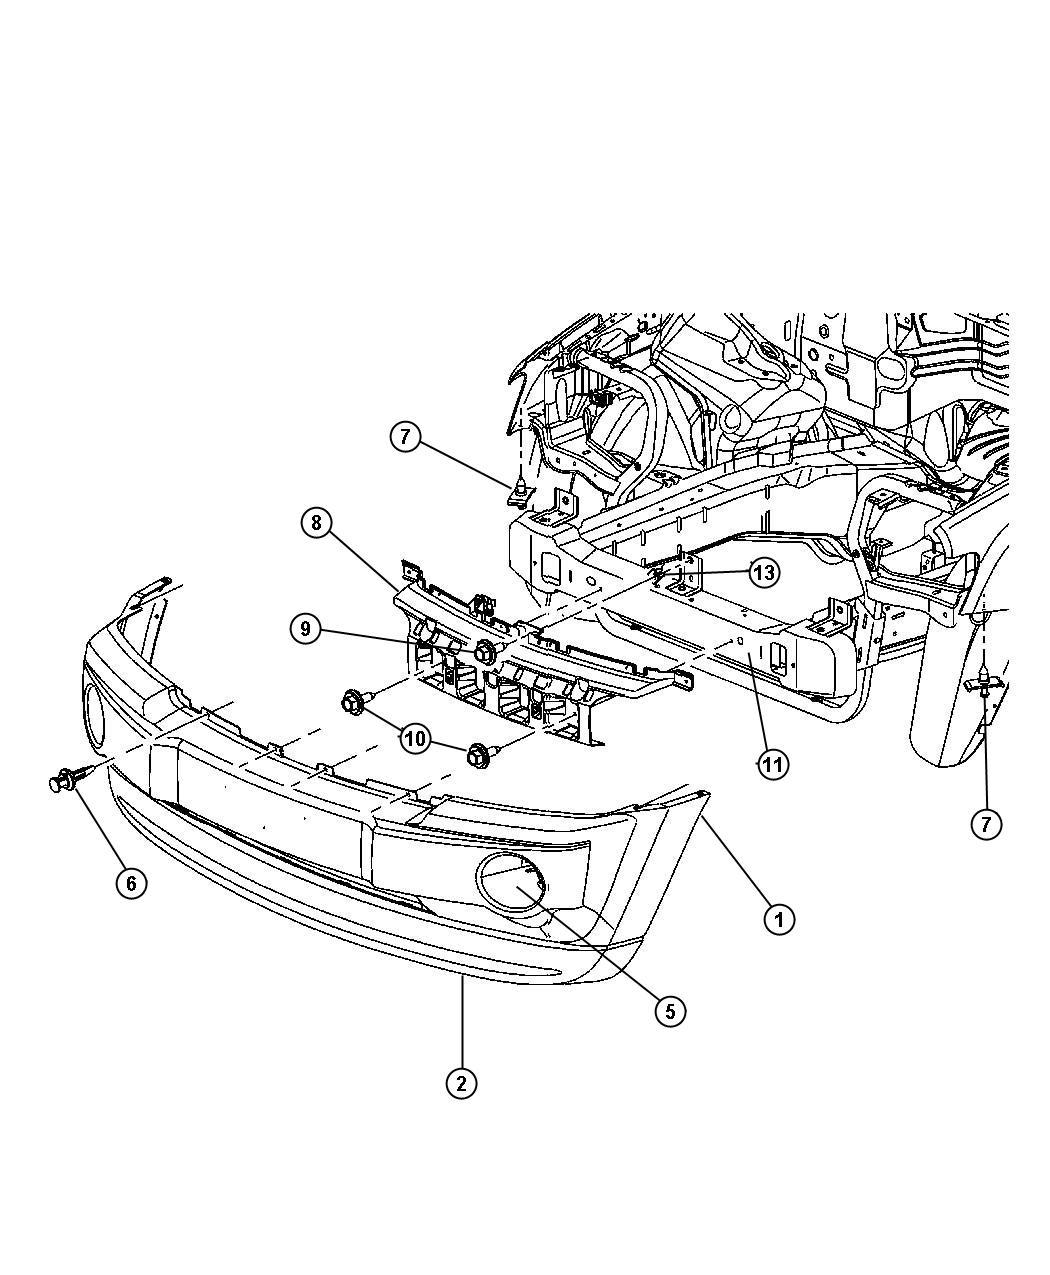 2014 Jeep Grand Cherokee SUMMIT 3.6L V6 4X4 Retainer. 1/4